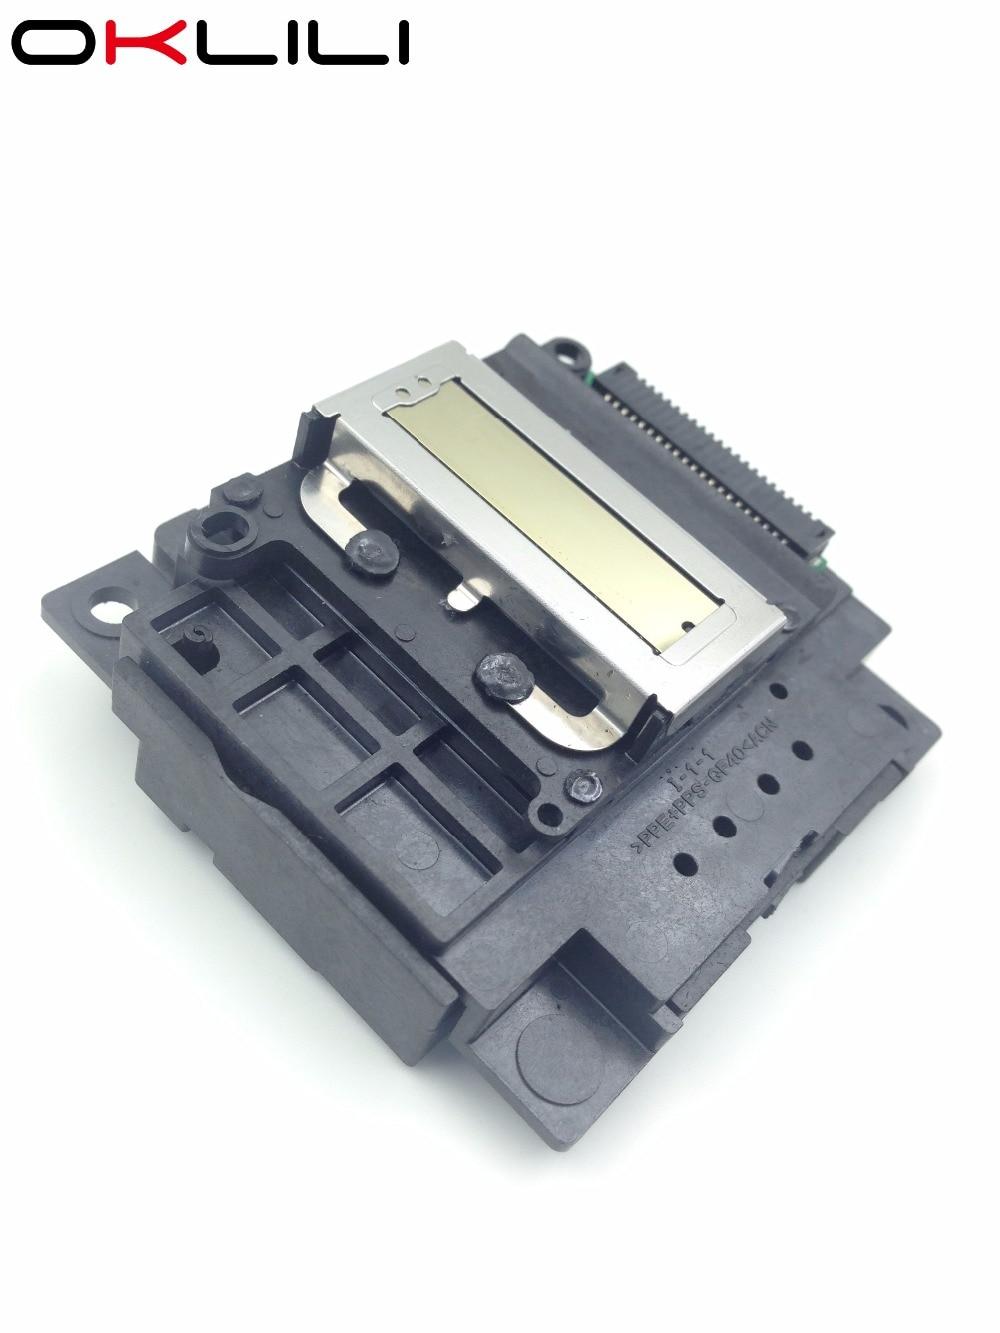 FA04000 FA04010 Printhead Print Head for Epson XP 302 XP 303 XP 305 XP 306 XP